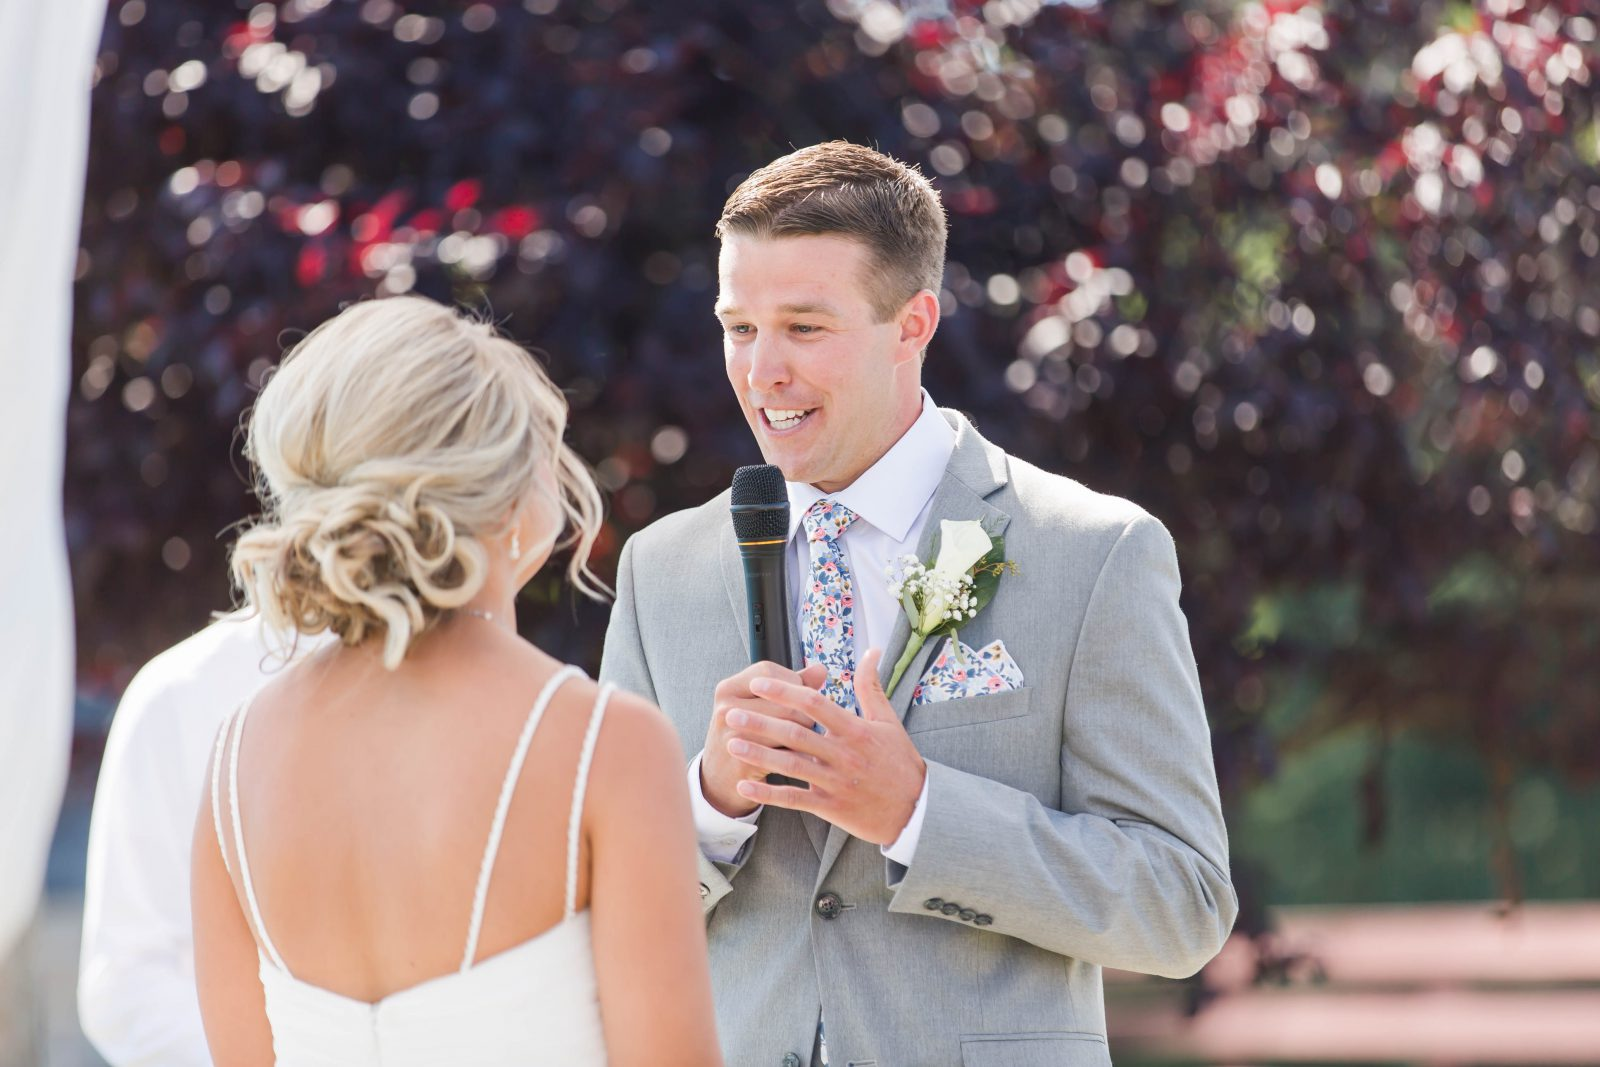 peacock-ridge-summer-wedding-photographer-akron-ohio-loren-jackson-photography-76